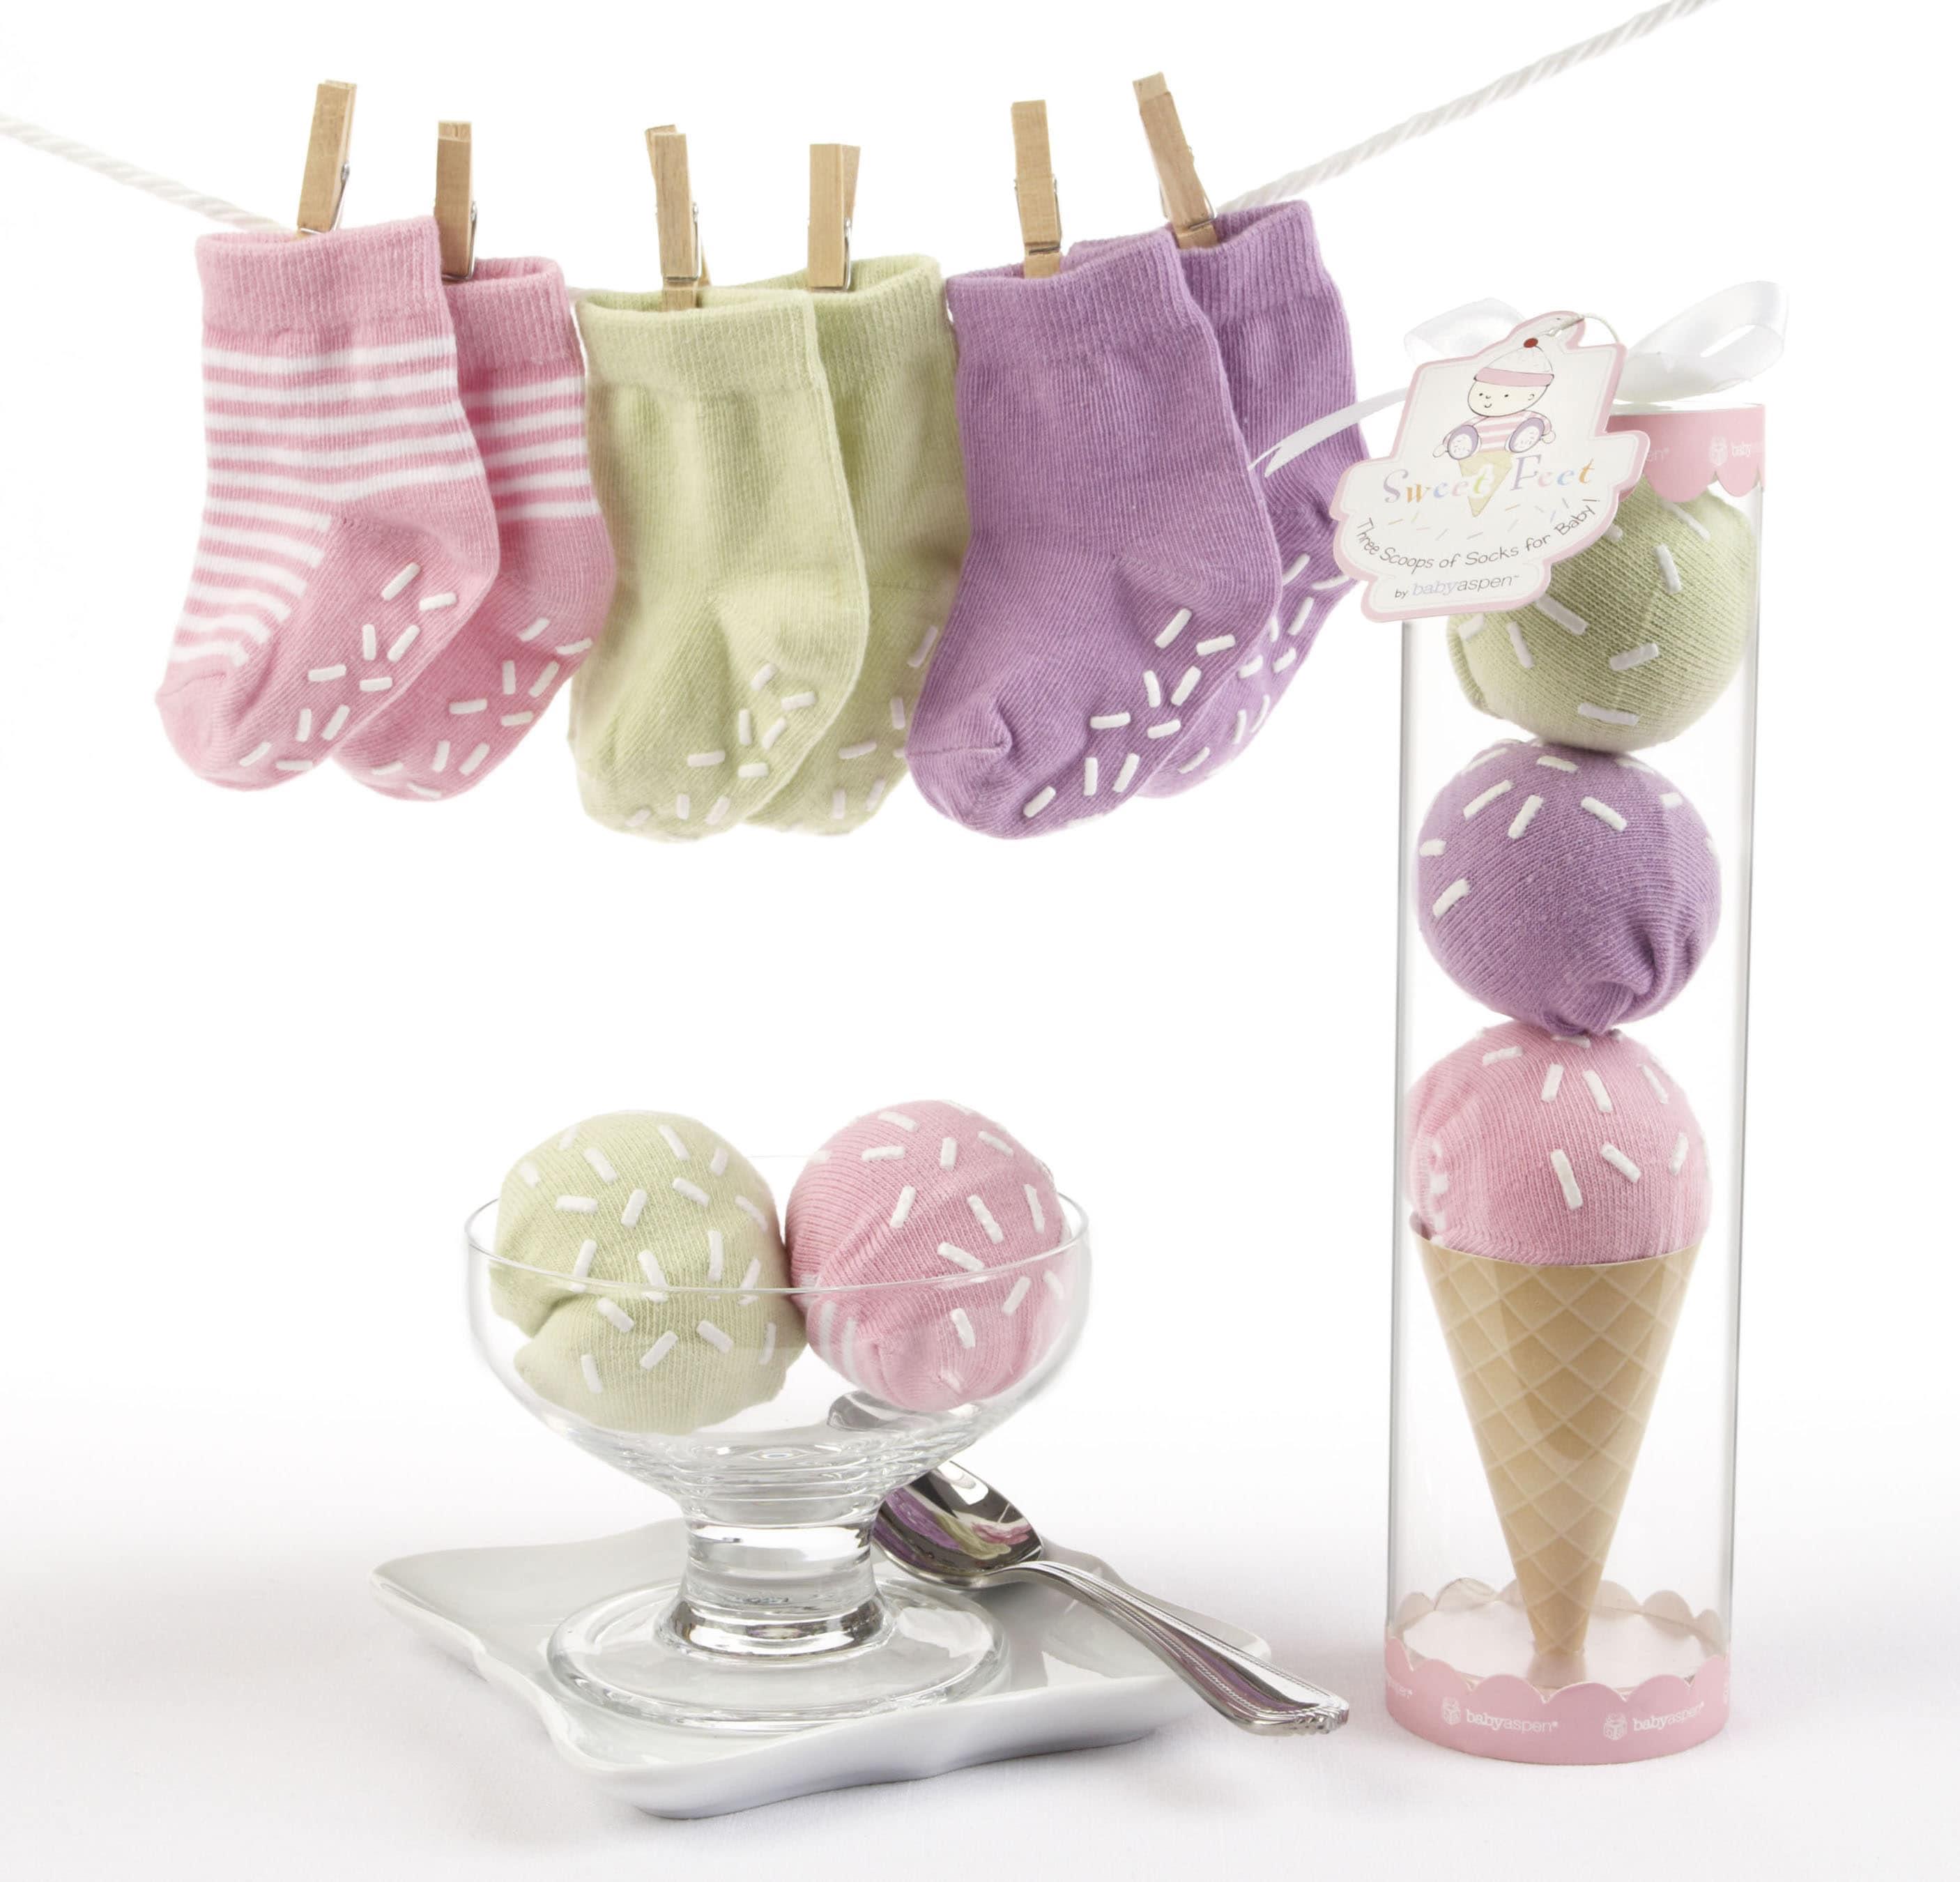 Baby Aspen Sweet Feet Three Scoops of Socks Gift Set in Pink